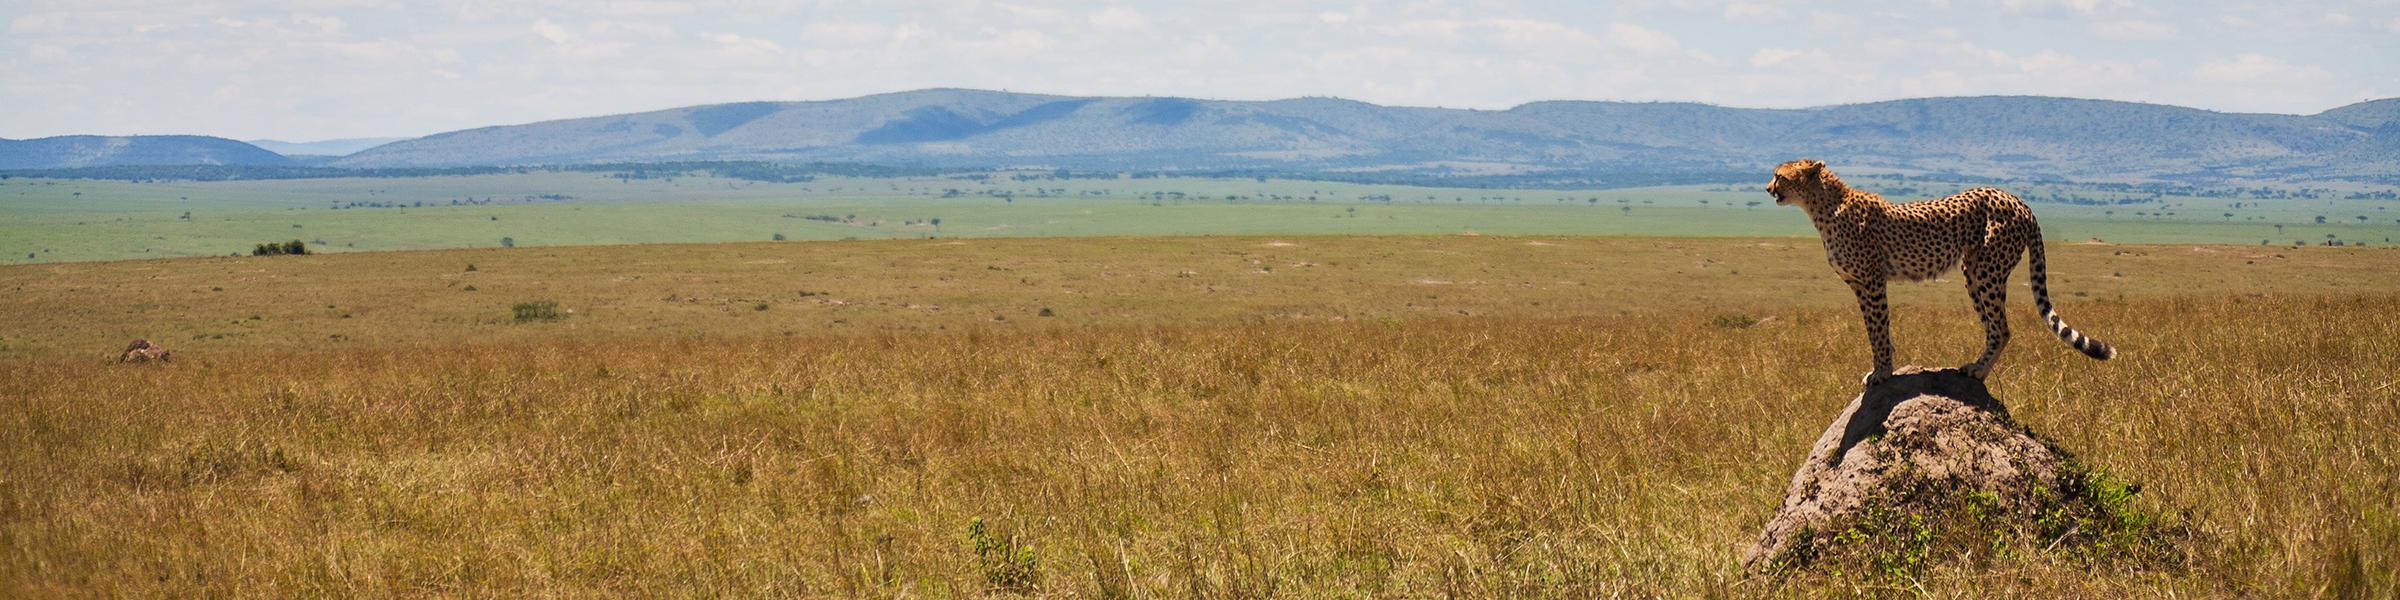 Kenya Maasai Mara National Reserve